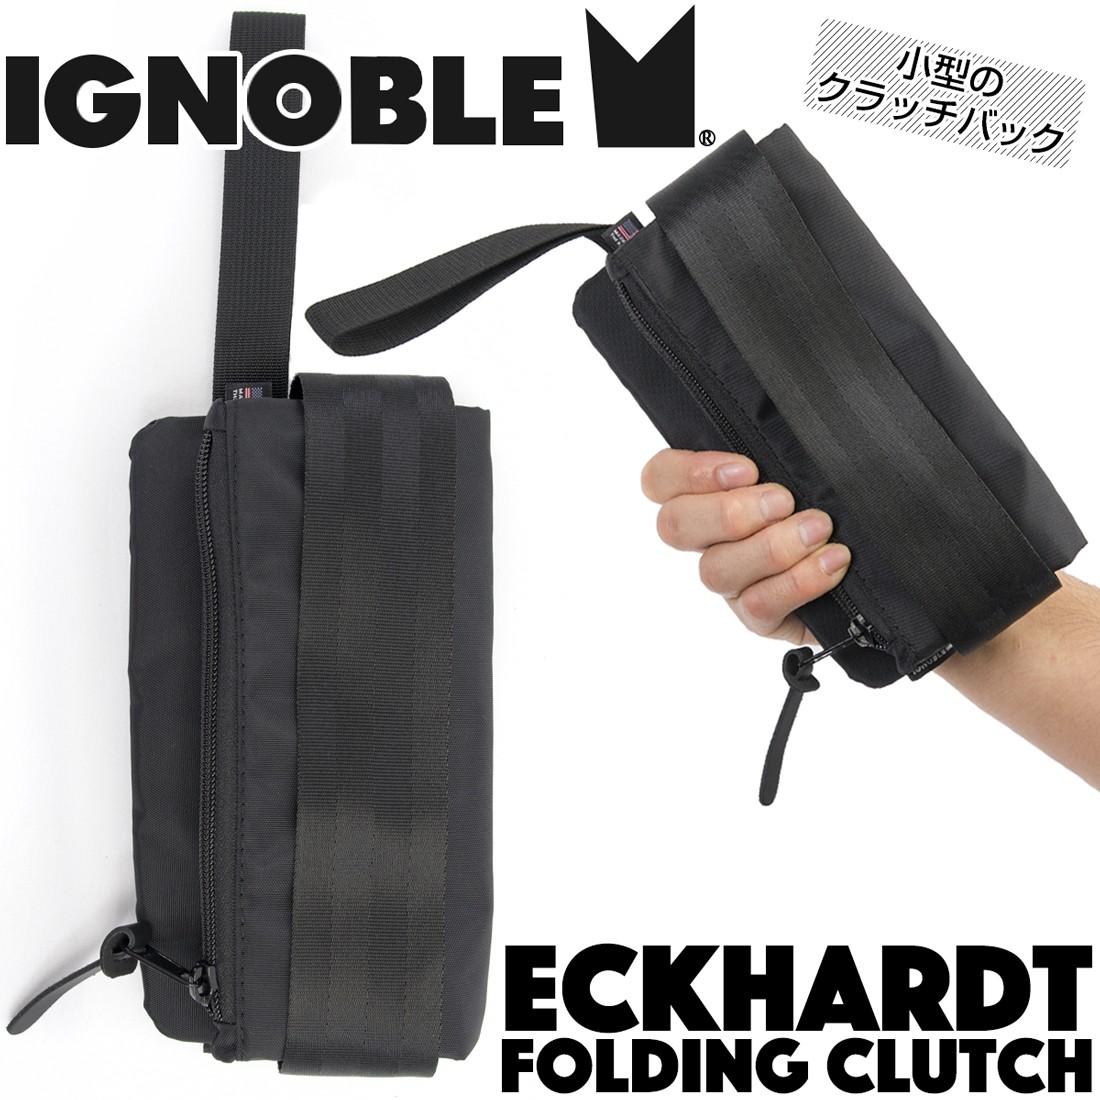 Eckhardt Folding Clutch